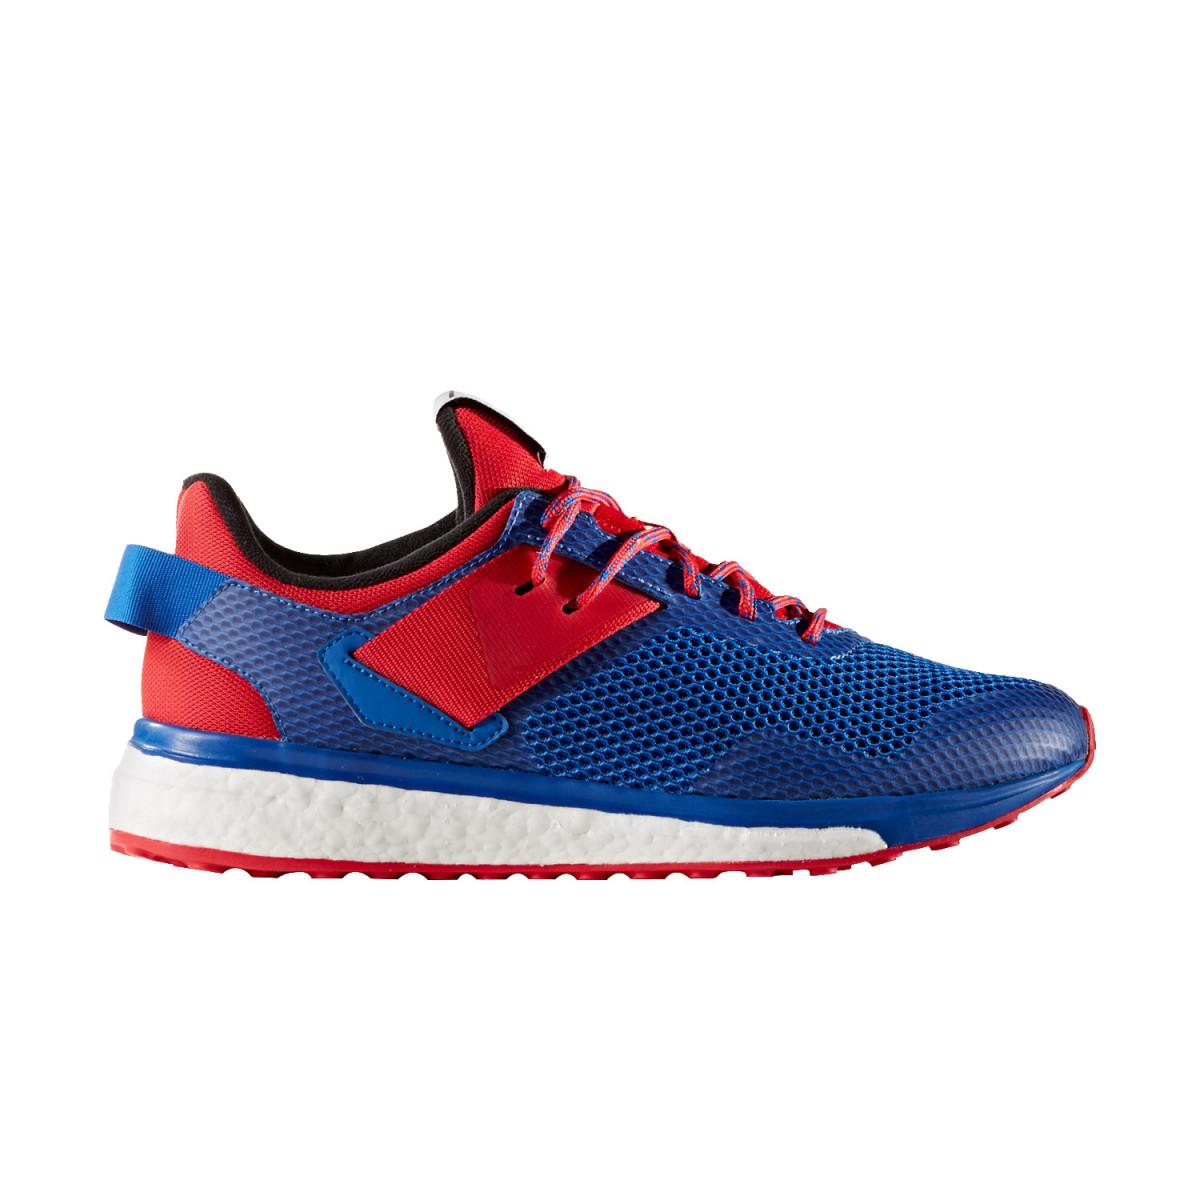 Zapatillas Adidas Response 3